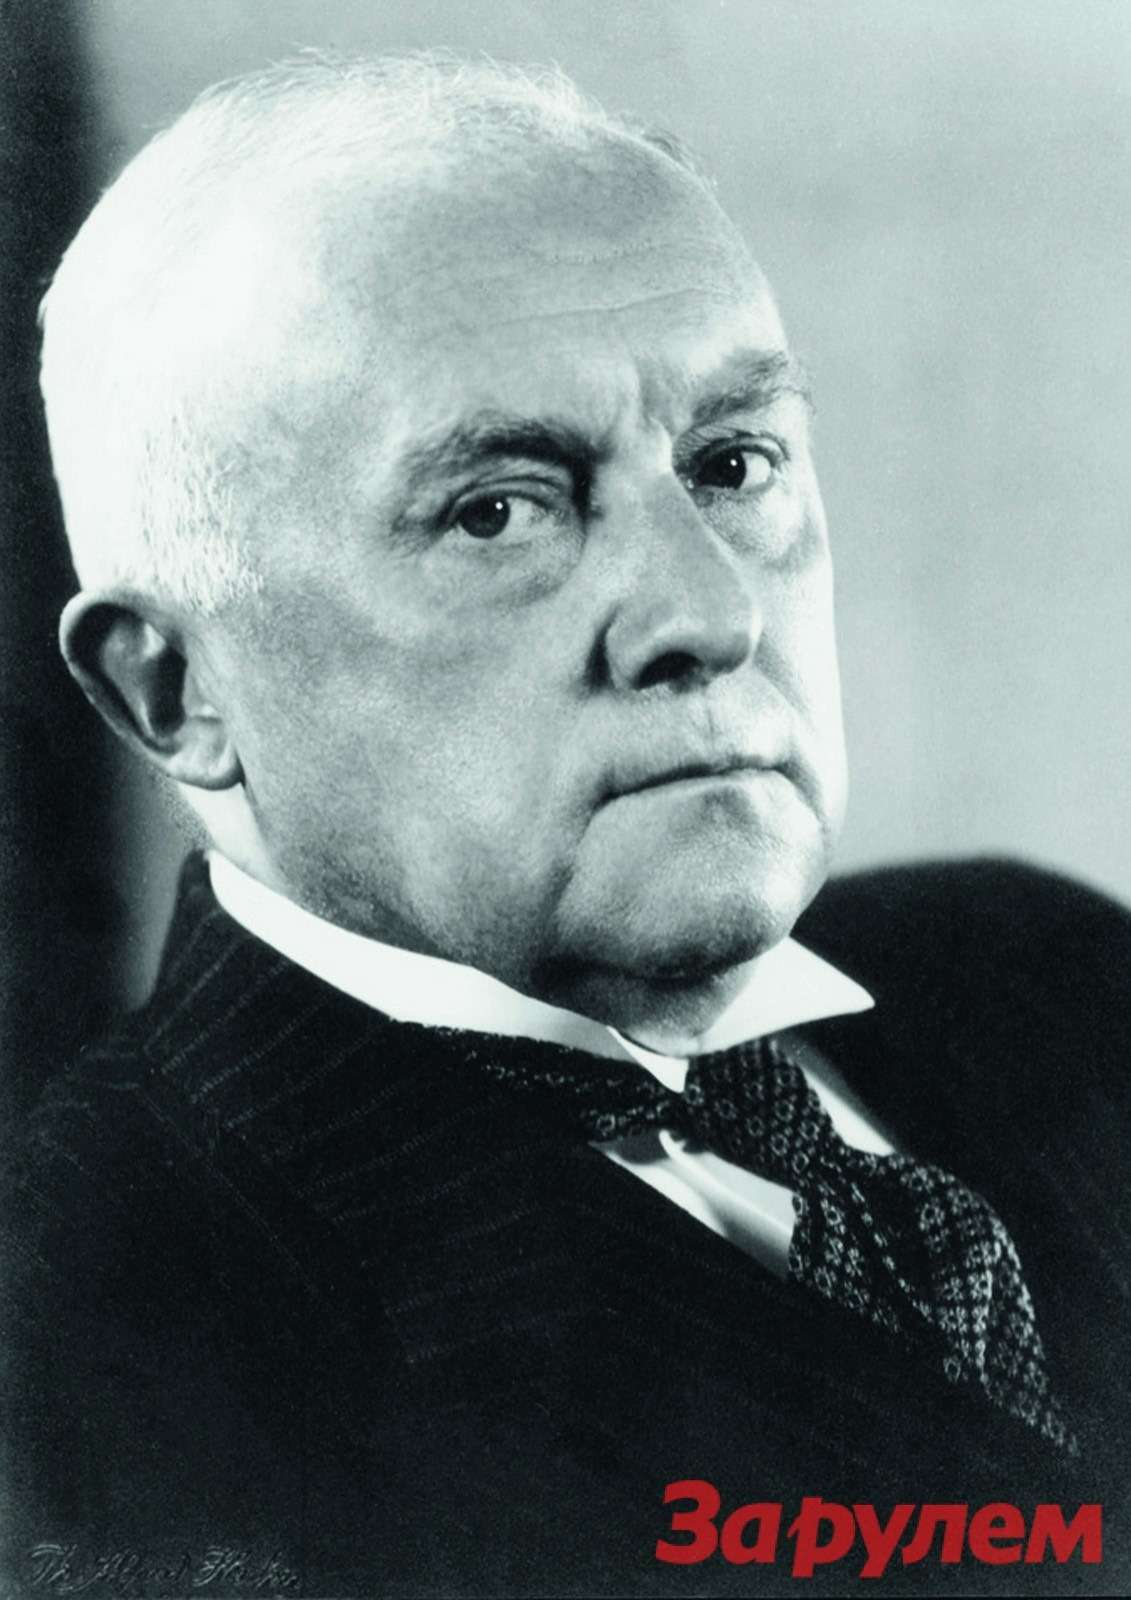 Йорген Скафте Расмуссен (1878— 1964гг.)